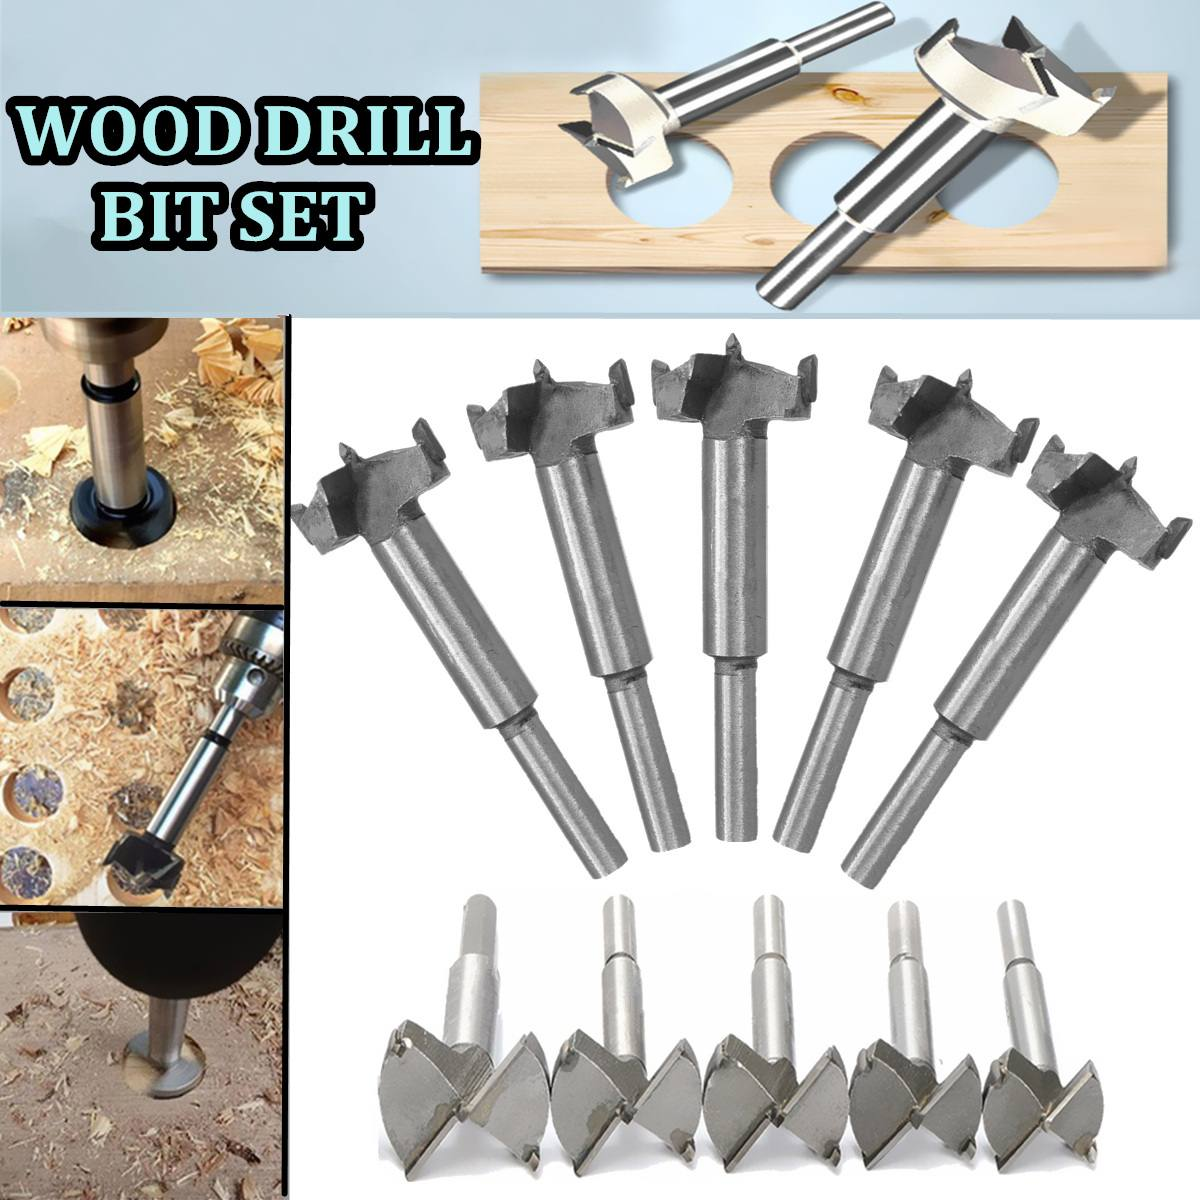 1pcs Forstner Wood Drill Bit Self Centering Hole Saw Cutter Woodworking Tools Set 14mm-65mm Hinge Forstner Drill Bits